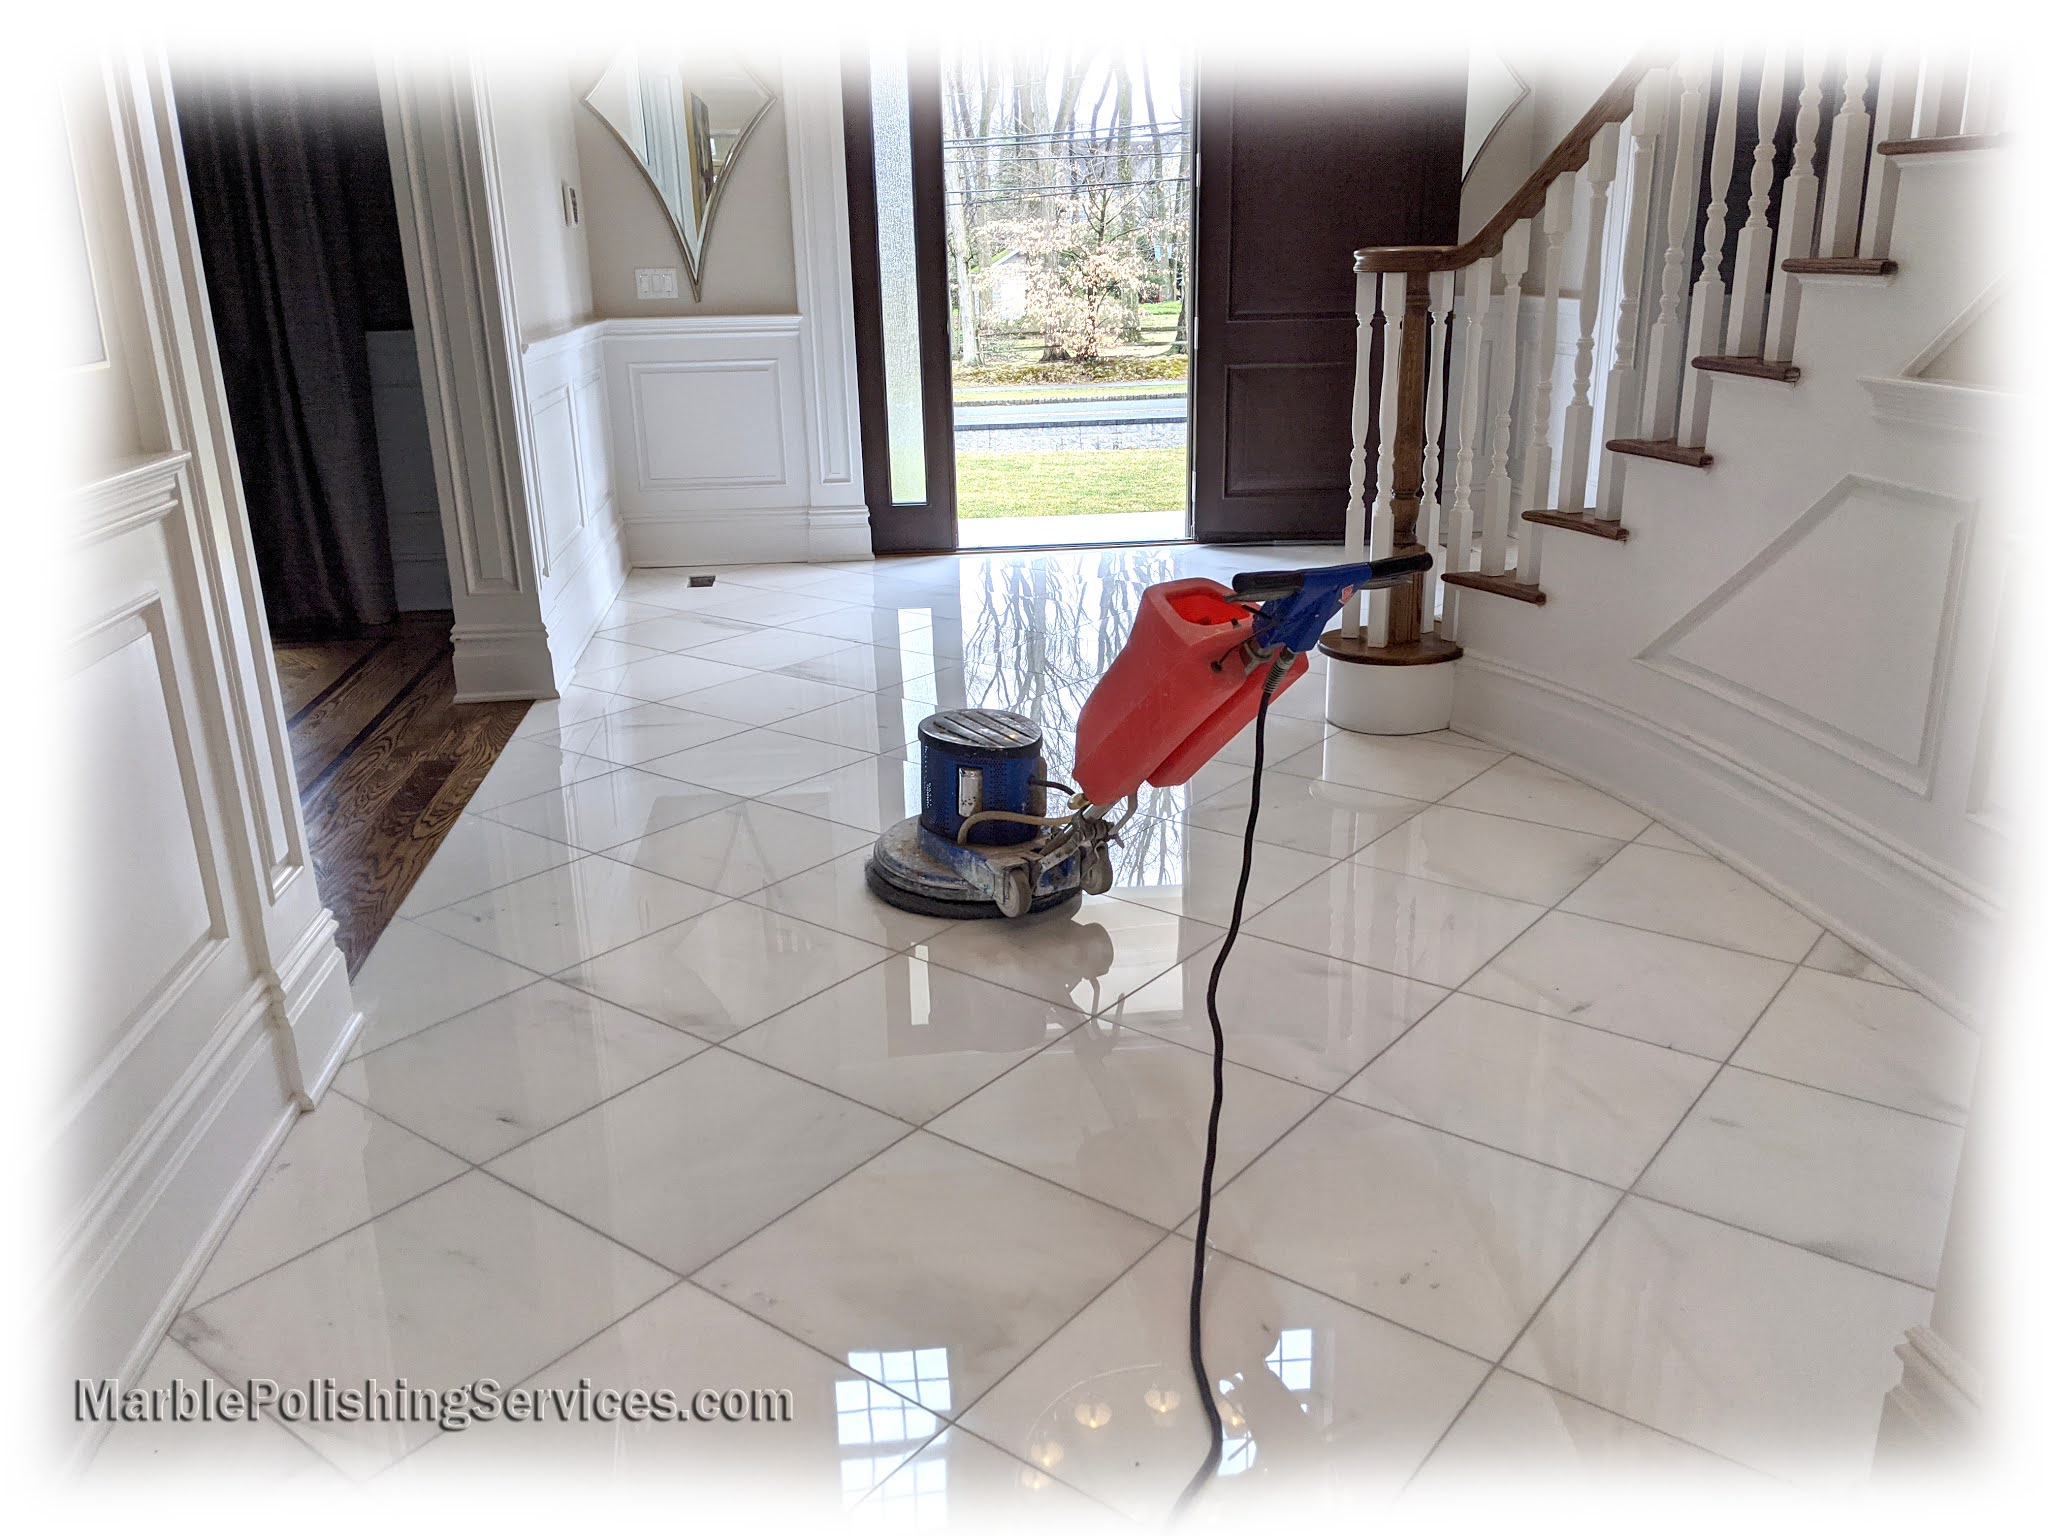 Marble Polishing Services – Marble Polishing and Stone Restoration